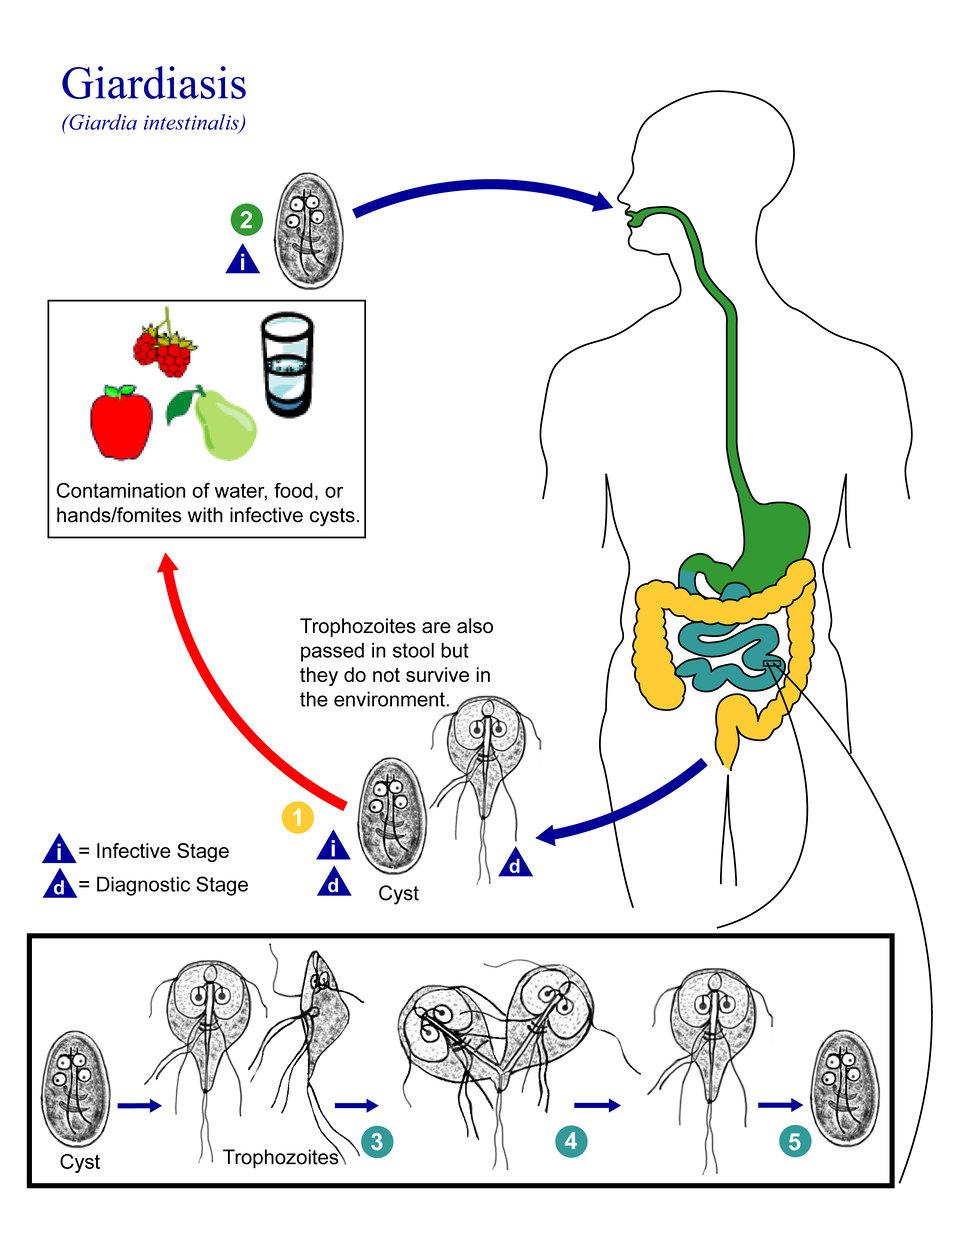 This is an illustration of the life cycle of Giardia lamblia (intestinalis), the causal agent of Giardiasis.